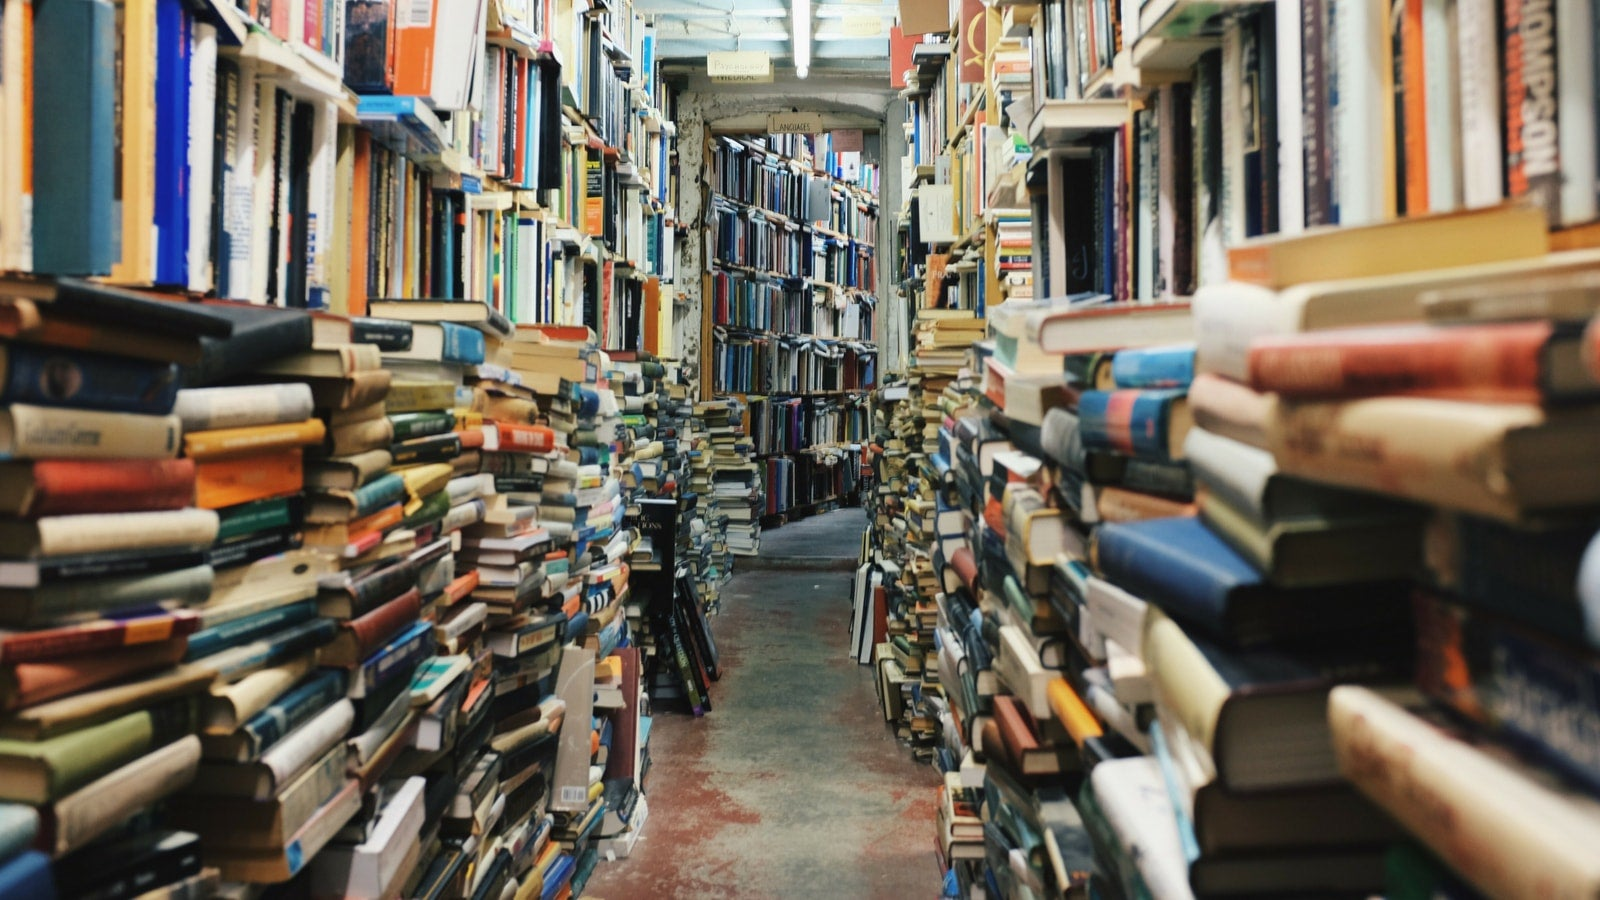 Corridor full of stacks of books in second hand bookshop